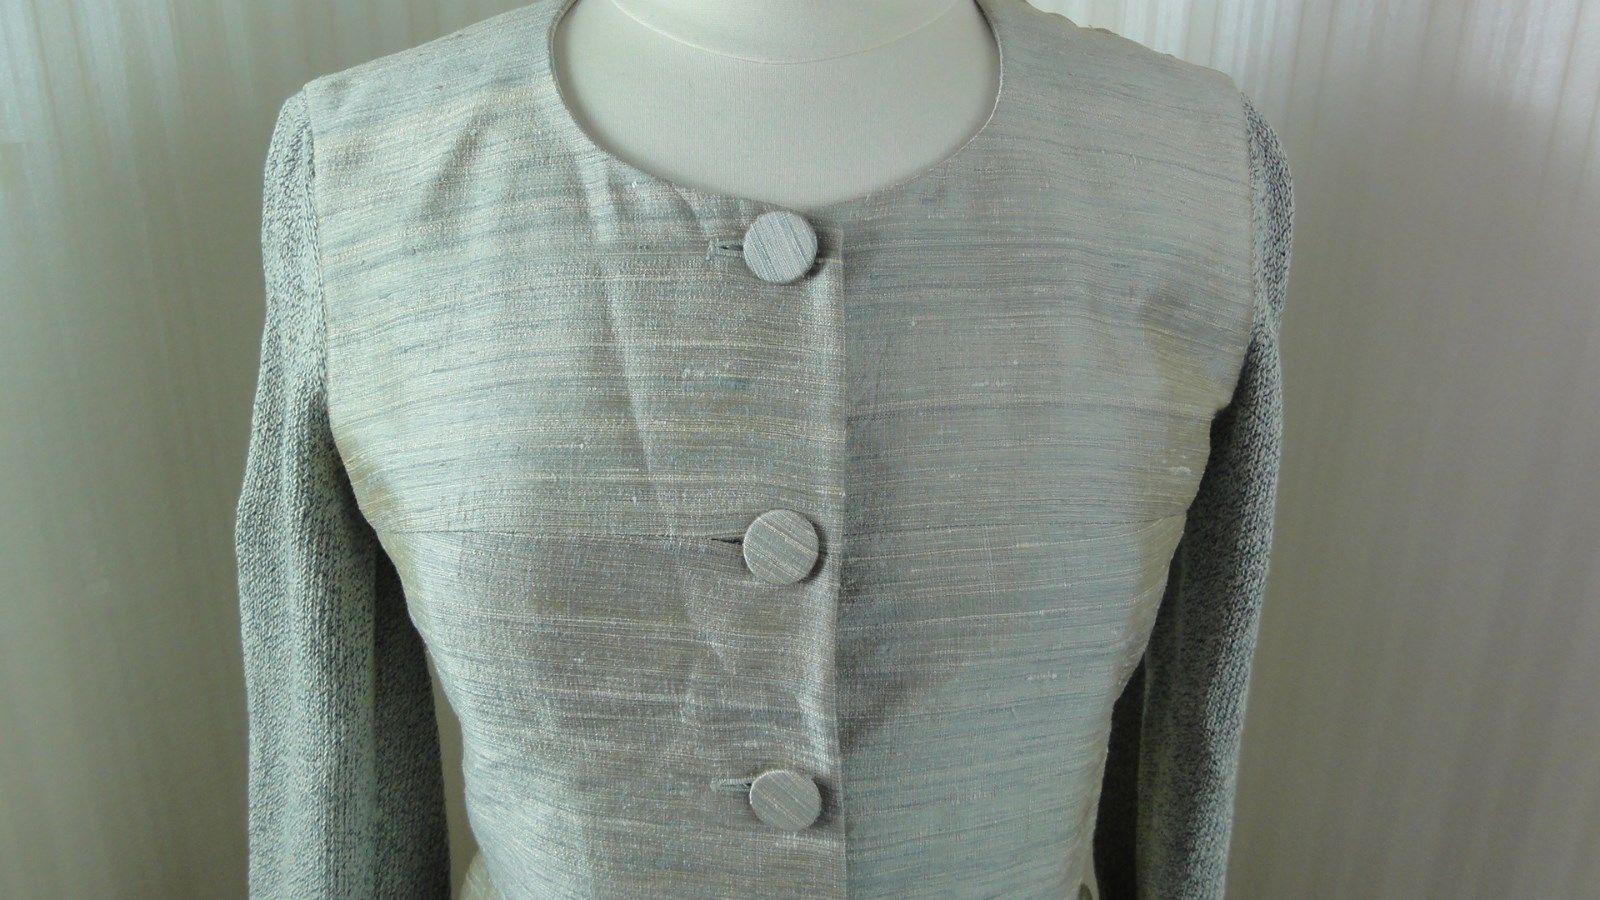 Vintage Emporio Armani Blazer Jacket Ladies size 42 M Gray